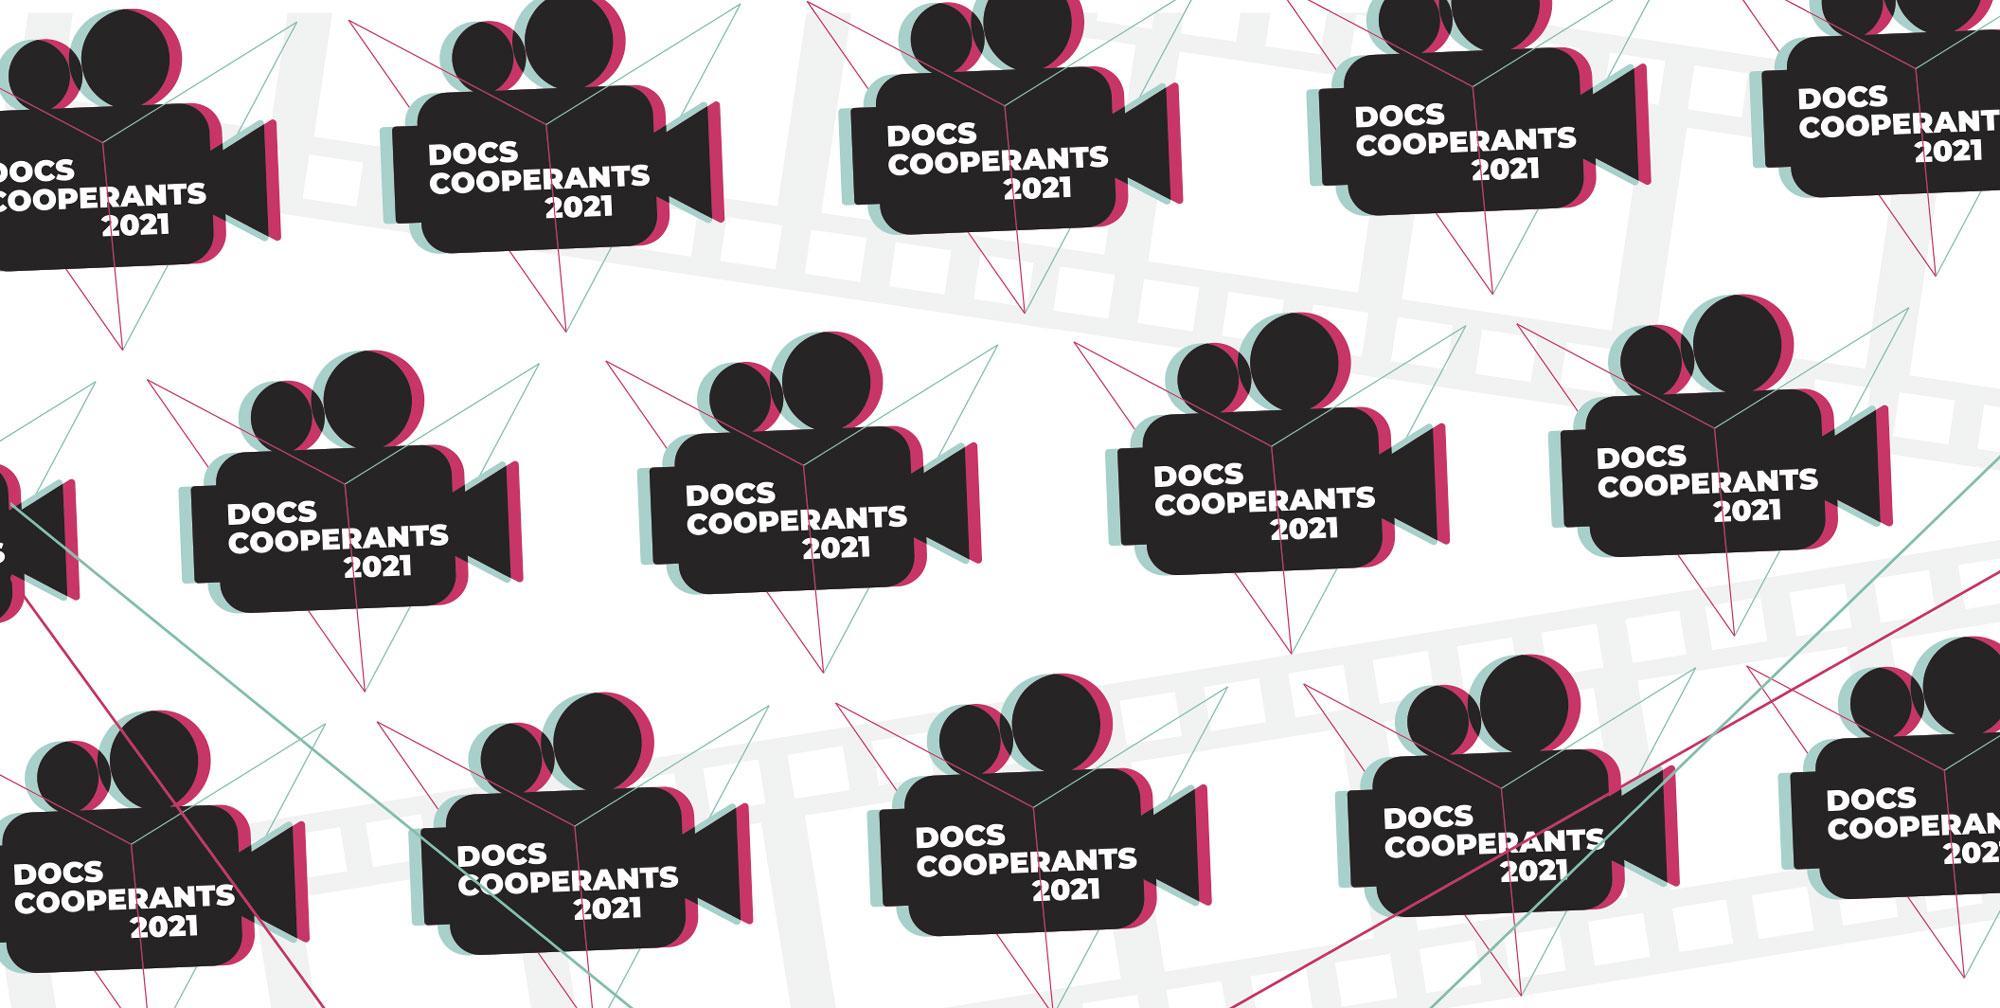 Docs Cooperants 2021